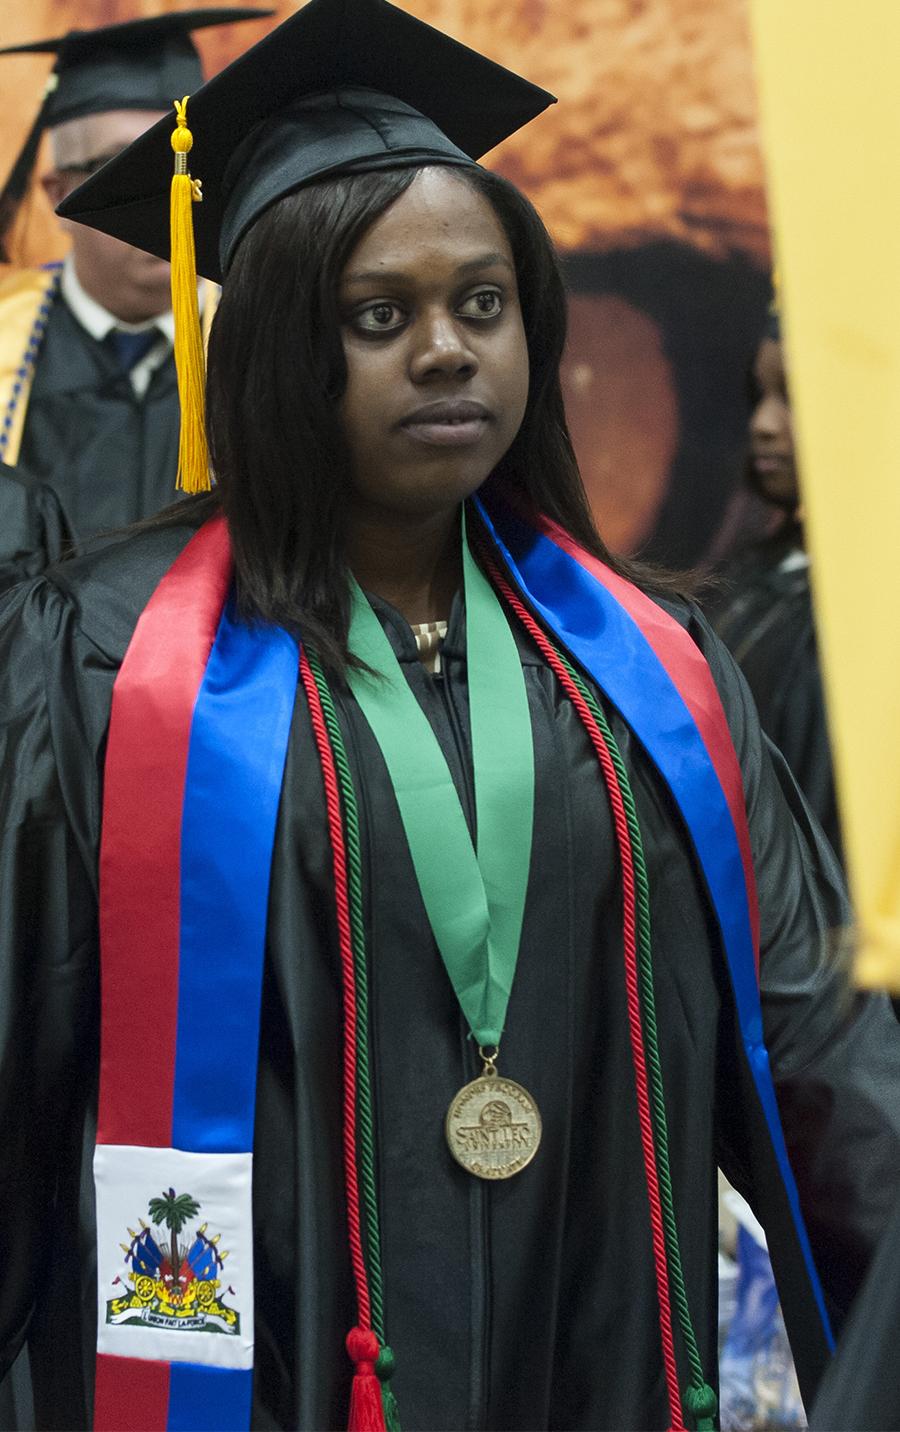 Cassy Anselme at graduation